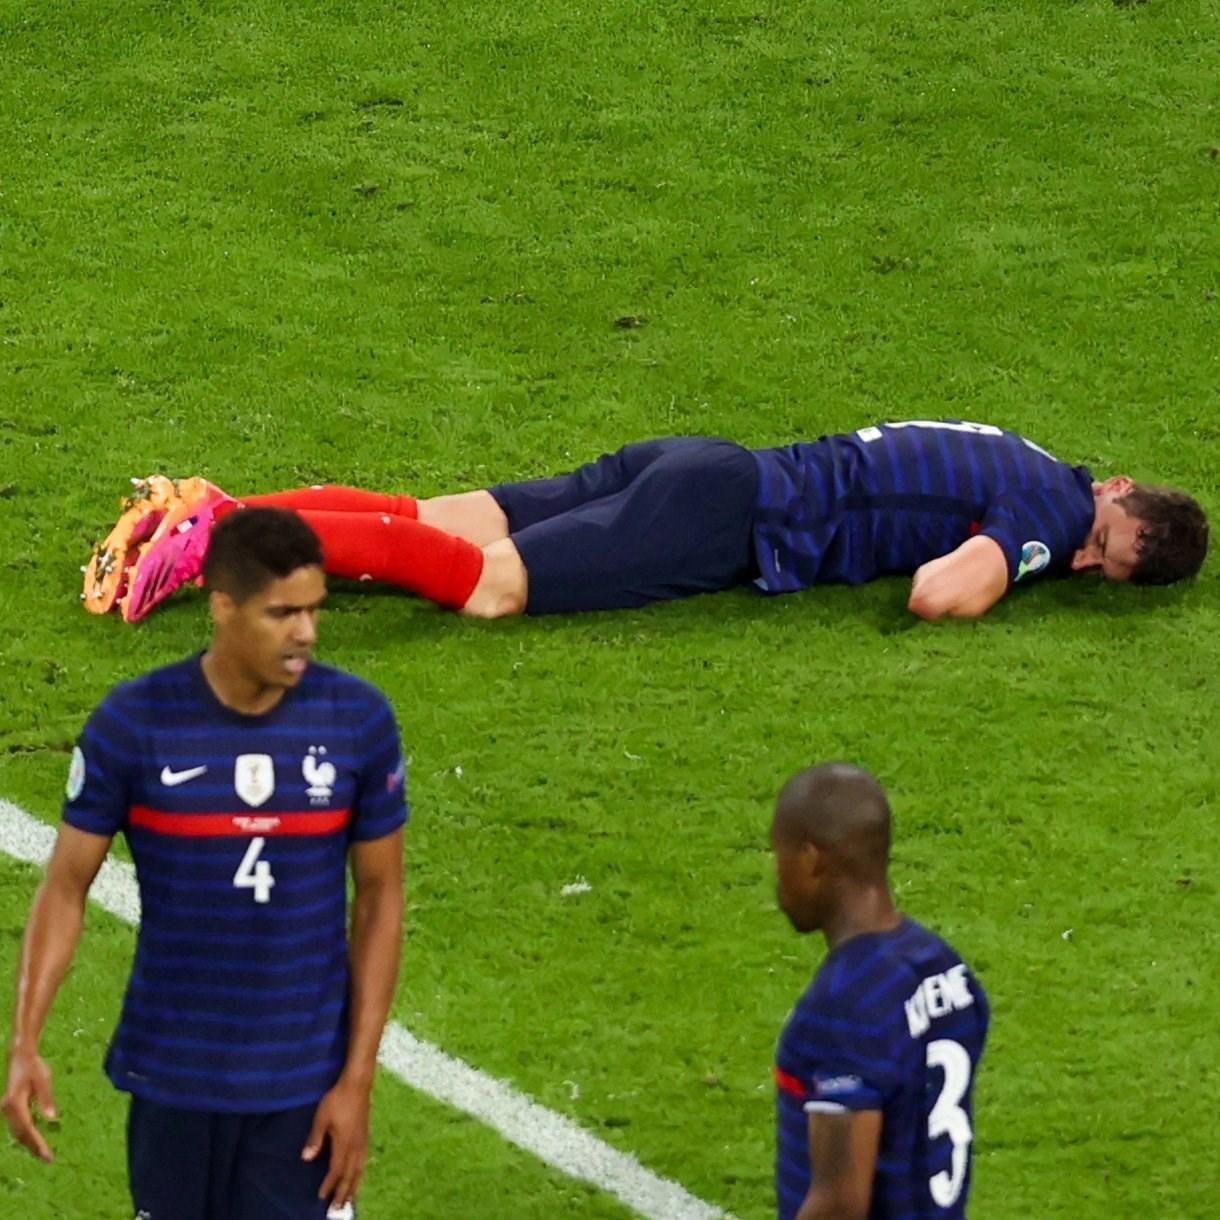 تیم ملی فوتبال فرانسه , تیم ملی فوتبال آلمان , یورو 2020 , تیم فوتبال بایرن مونیخ ,